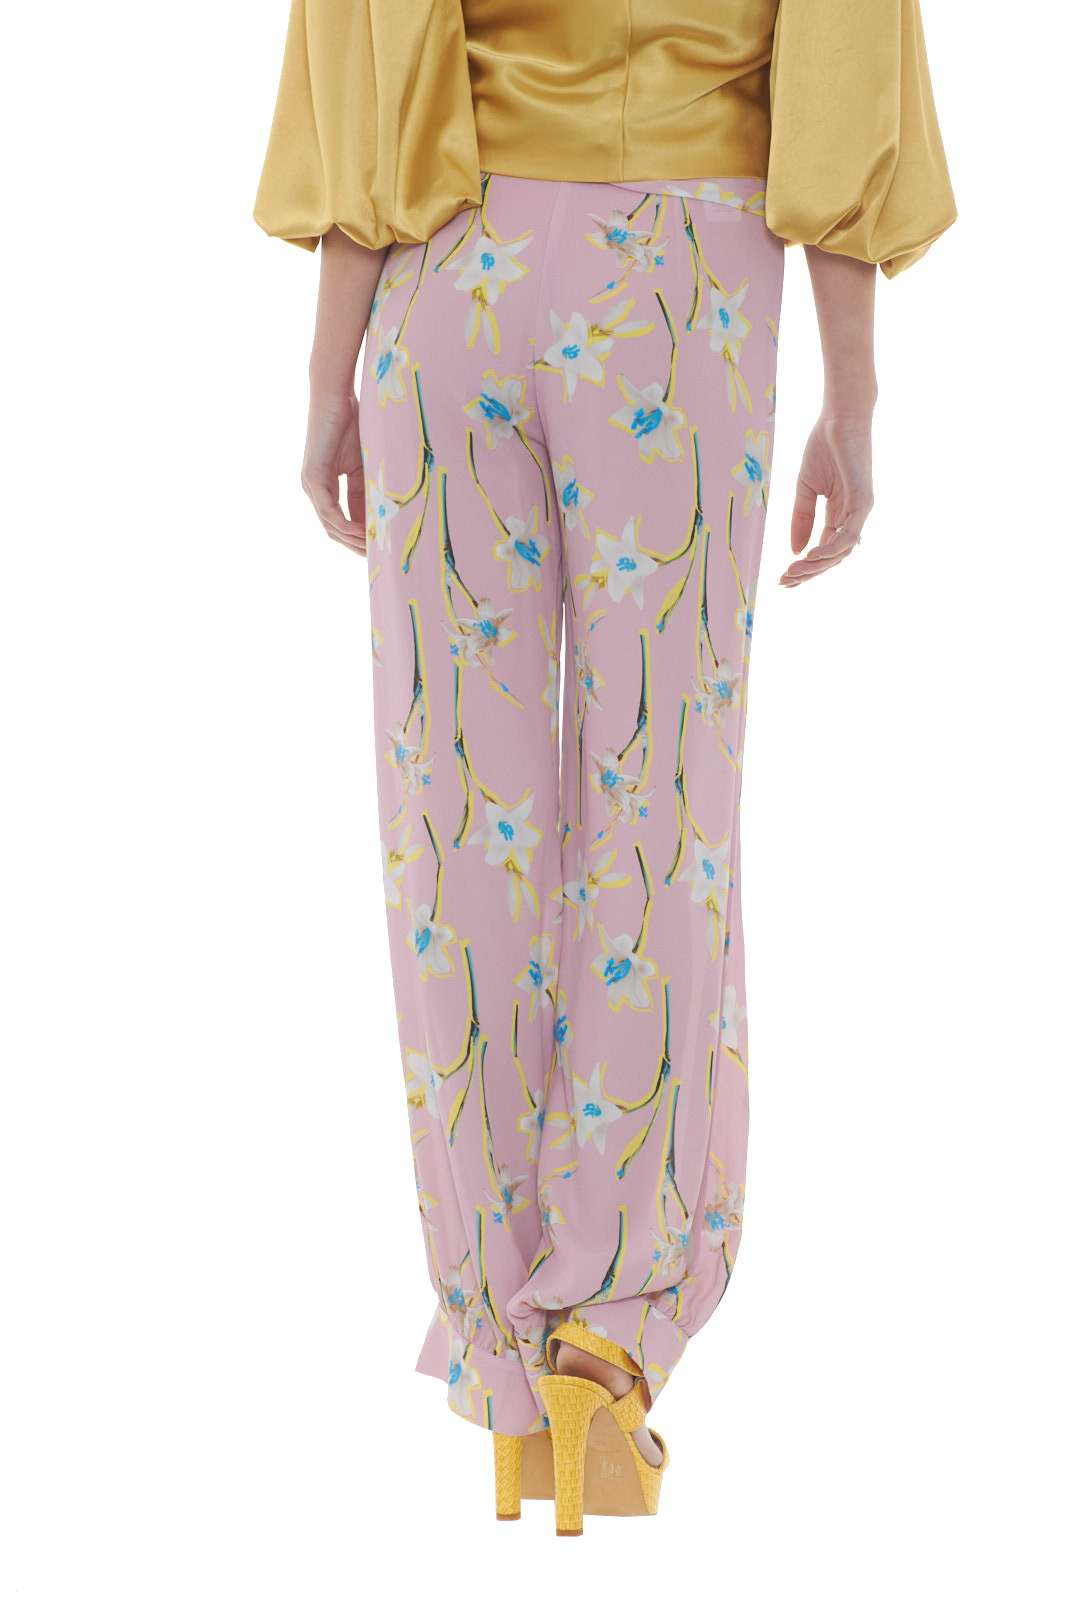 https://www.parmax.com/media/catalog/product/a/i/PE-outlet_parmax-pantaloni-donna-Pinko-1g14kc-C.jpg